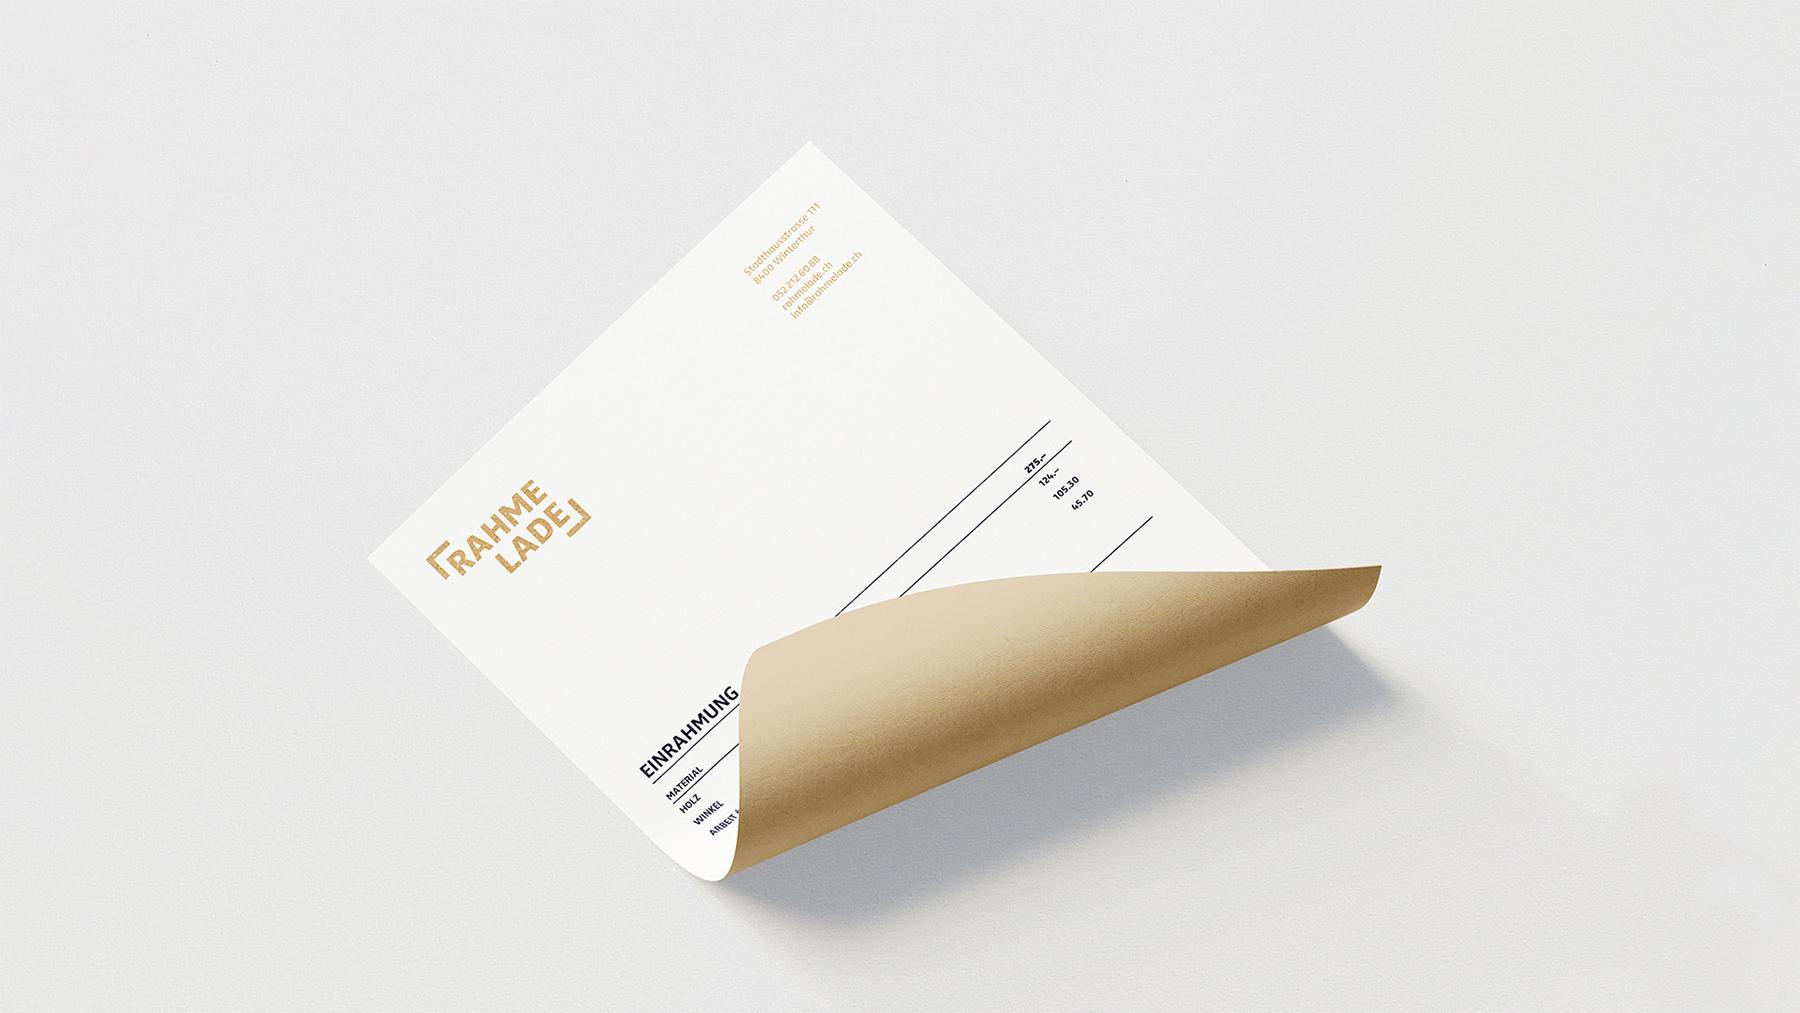 Branding, Briefpapier, Briefschaft